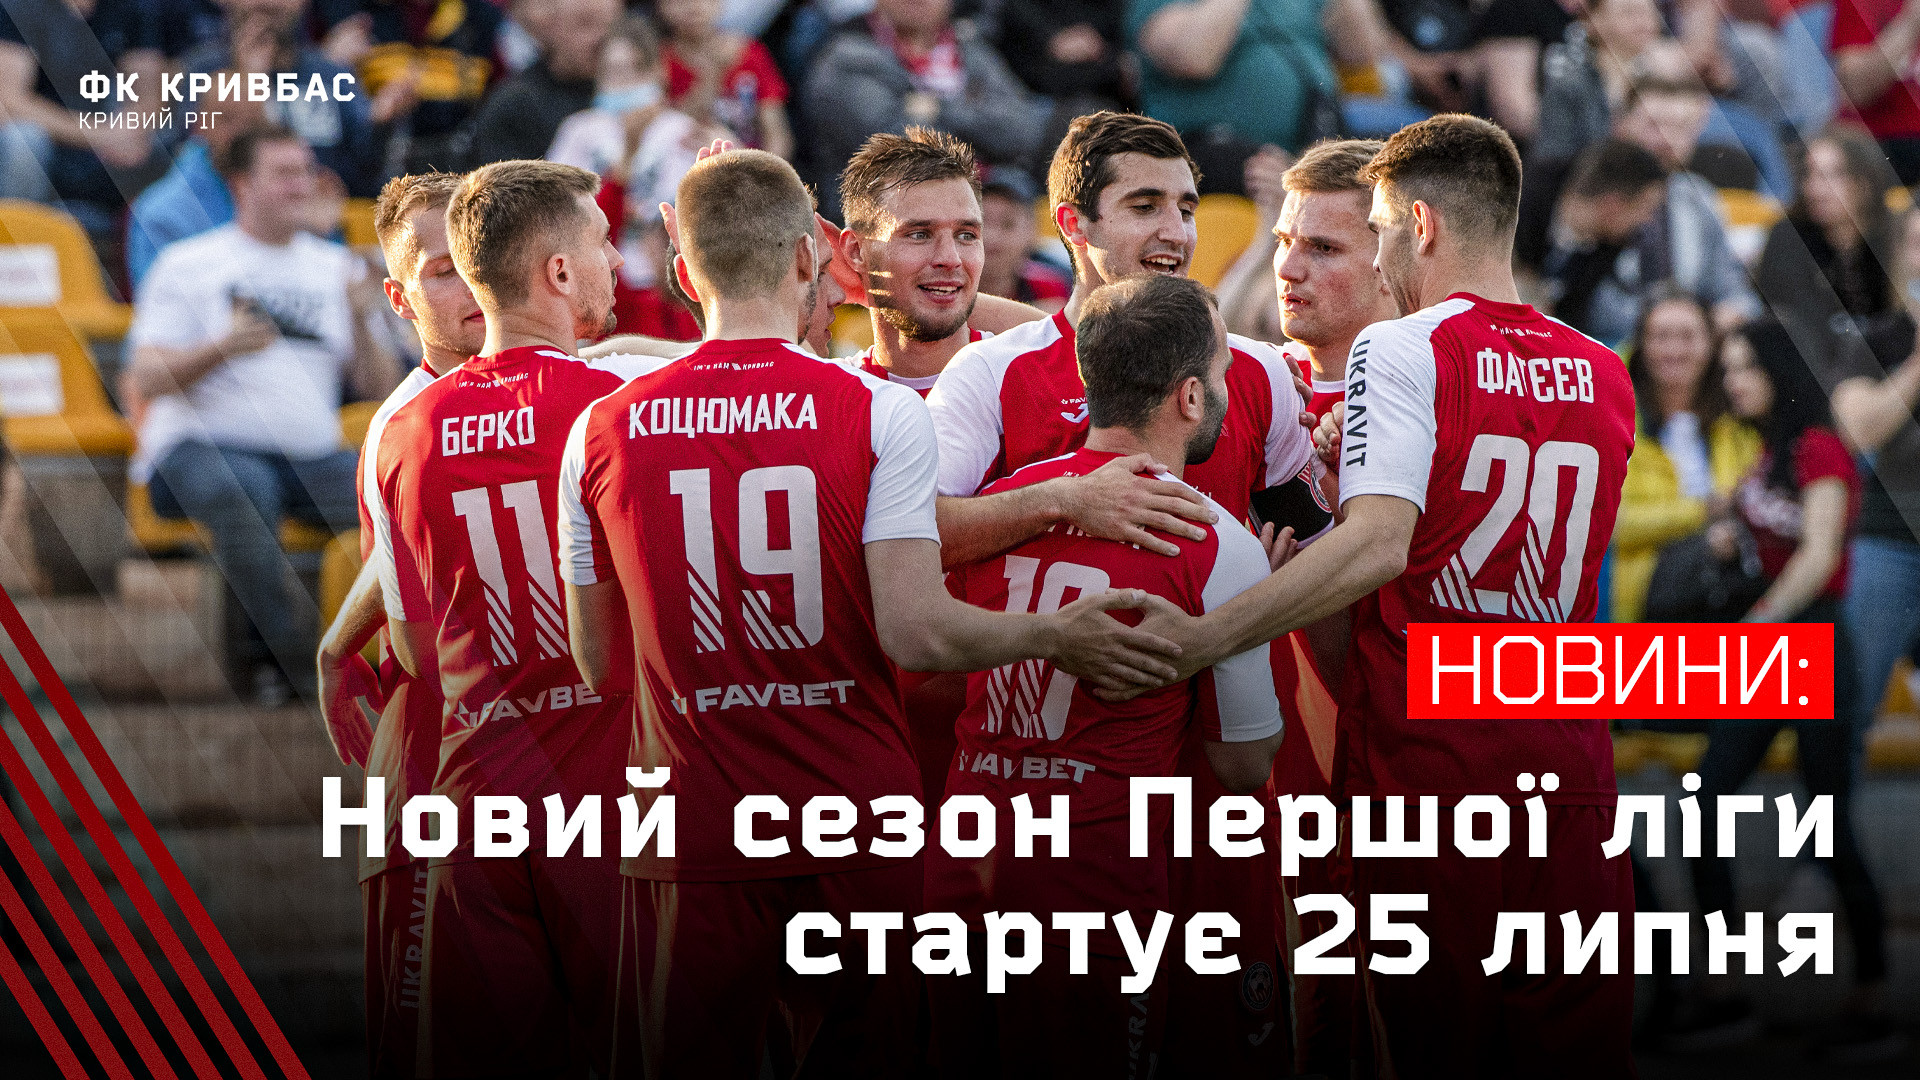 Центральна рада ПФЛ визначила дату старту Першої ліги-2021/22}